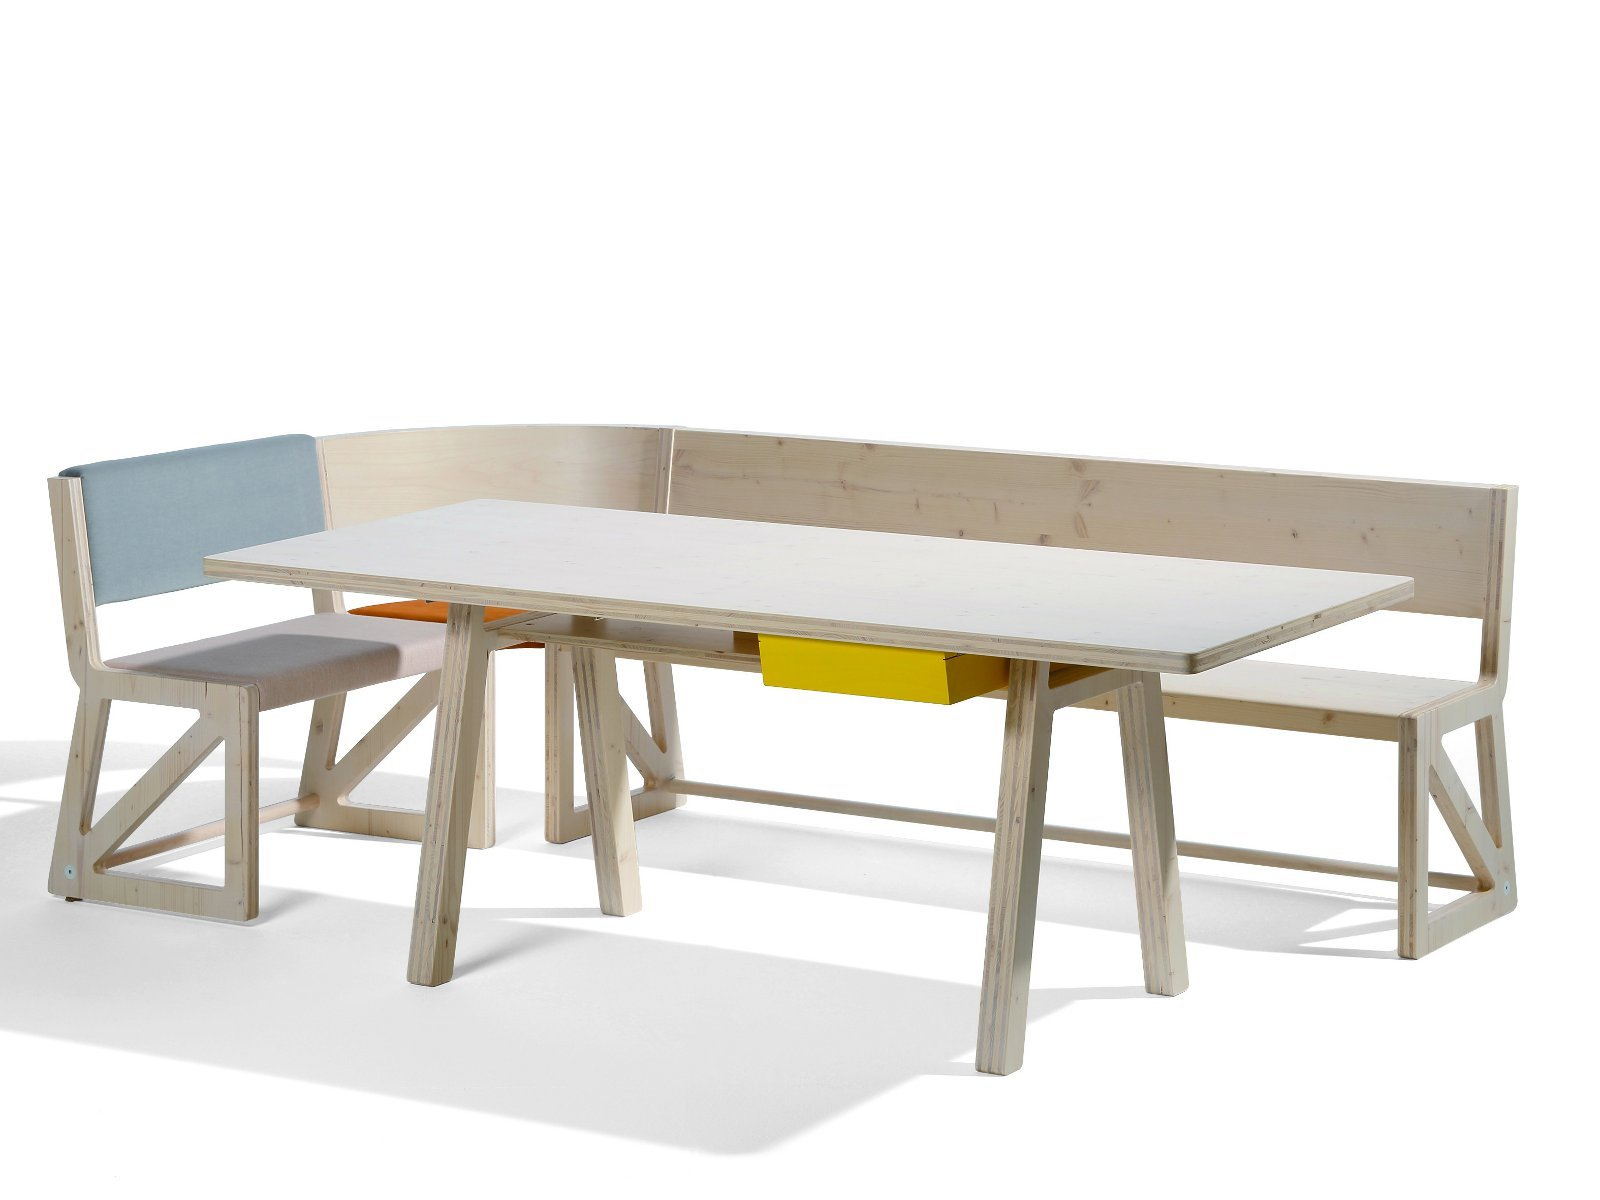 panca in legno massello collezione stijl by richard lampert design alexander seifried. Black Bedroom Furniture Sets. Home Design Ideas